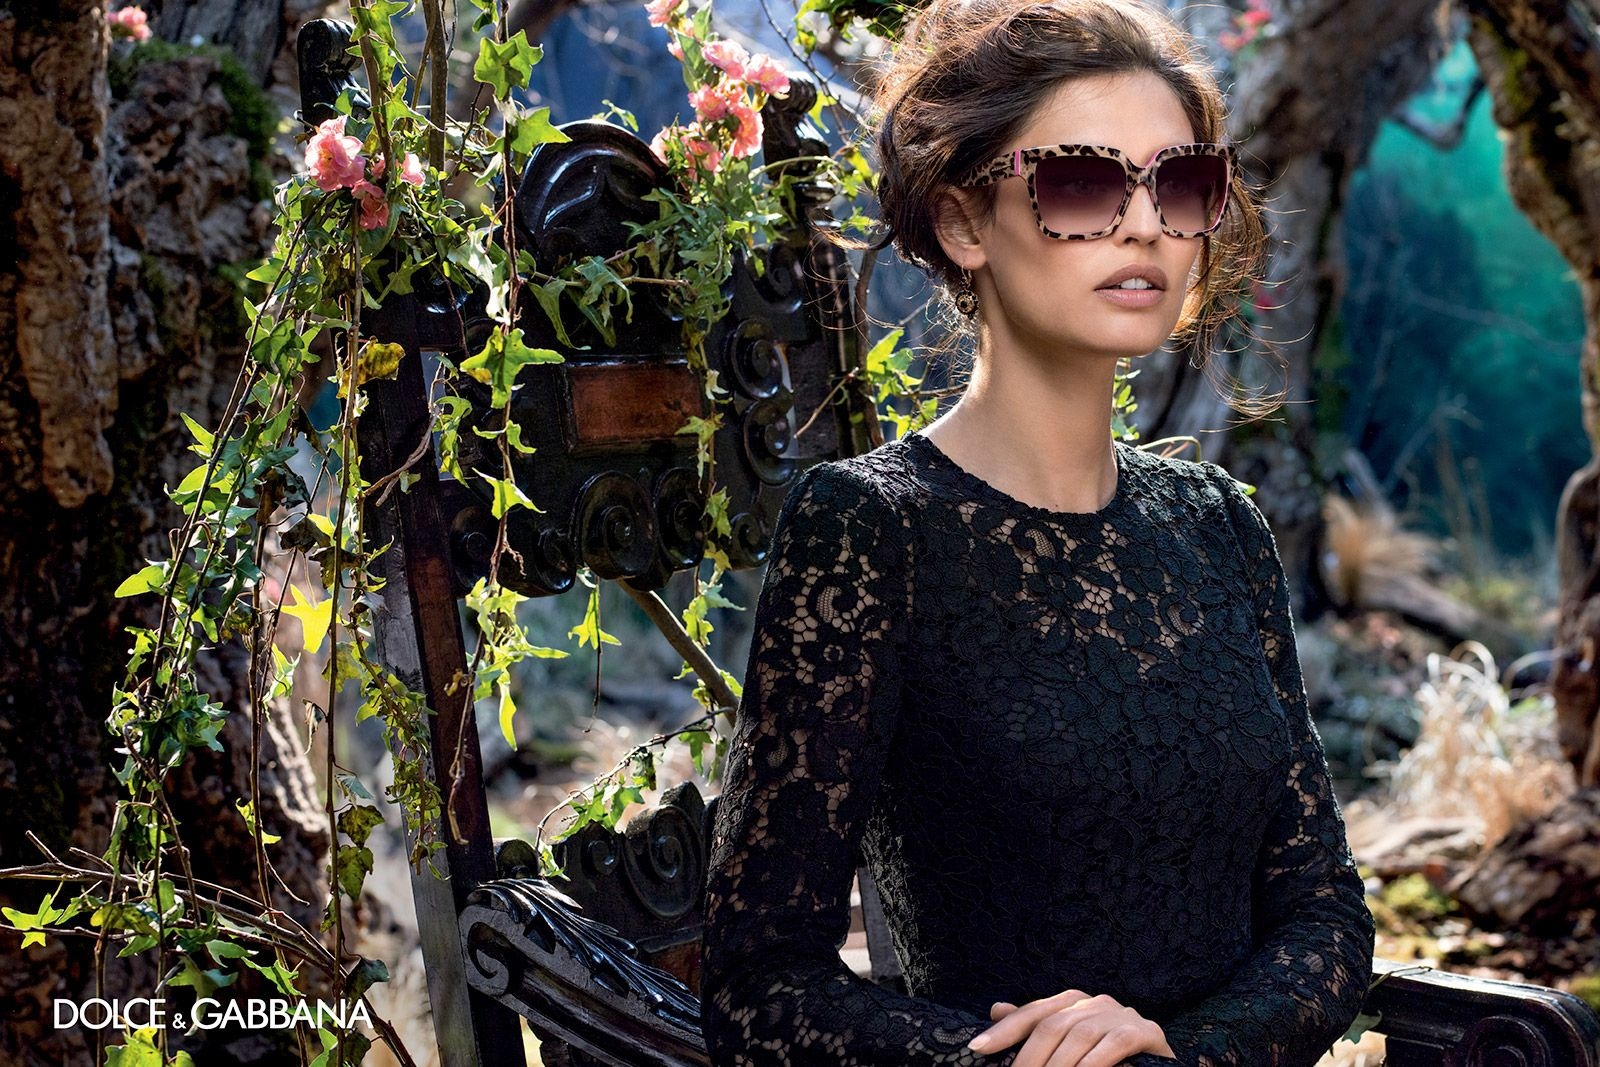 Eyeglasses Dolceamp; Eyewear And Gabbana Sunglasses wnX80OPk